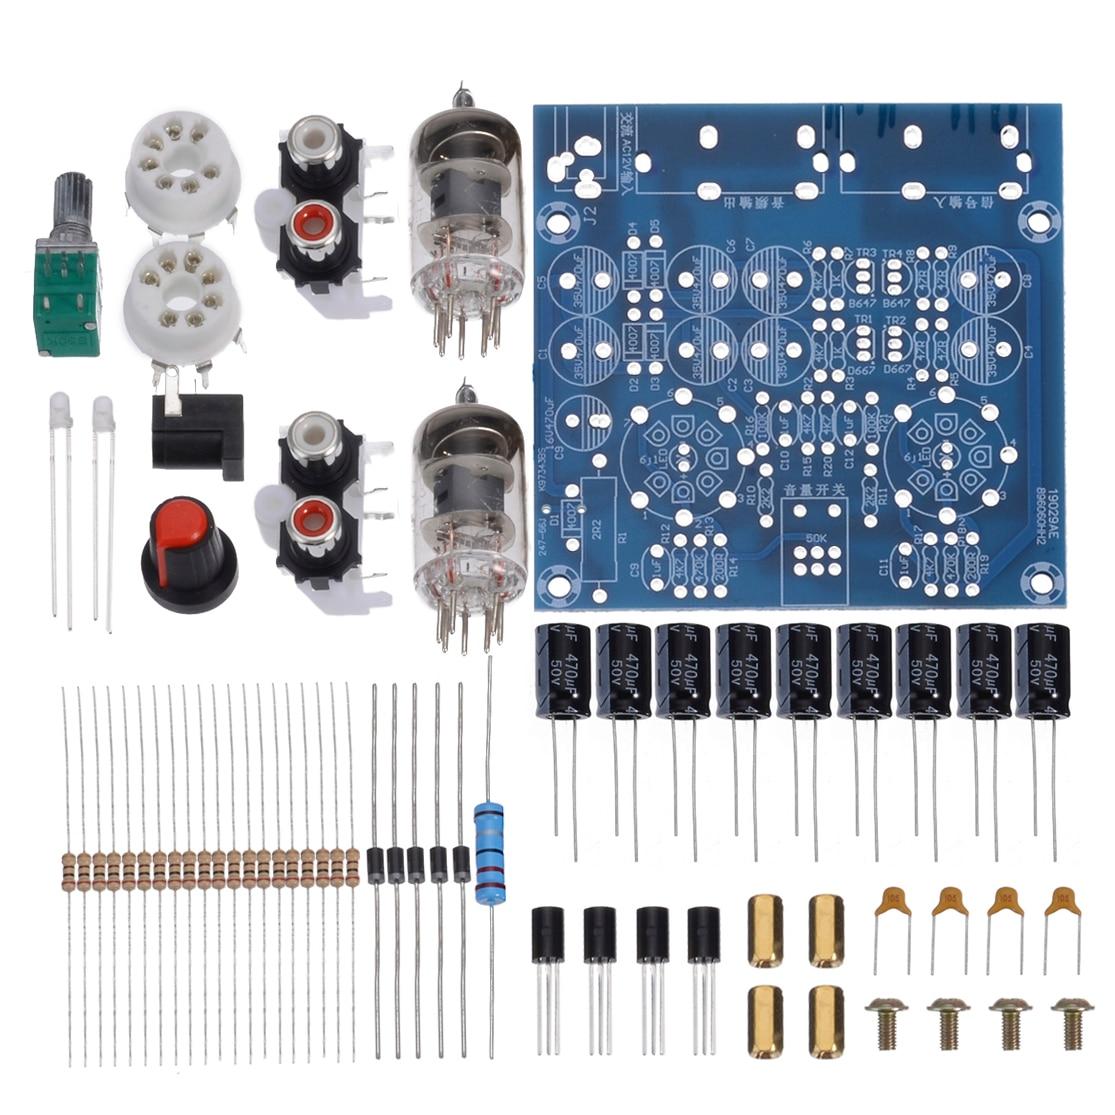 1pc DIY Tube Amplifier Audio Board 2.0 Channel AC12V 0.8 A Pre-Amp Audio Mixer 6J1 Valve Bile Buffer Amplifiers DIY Kit